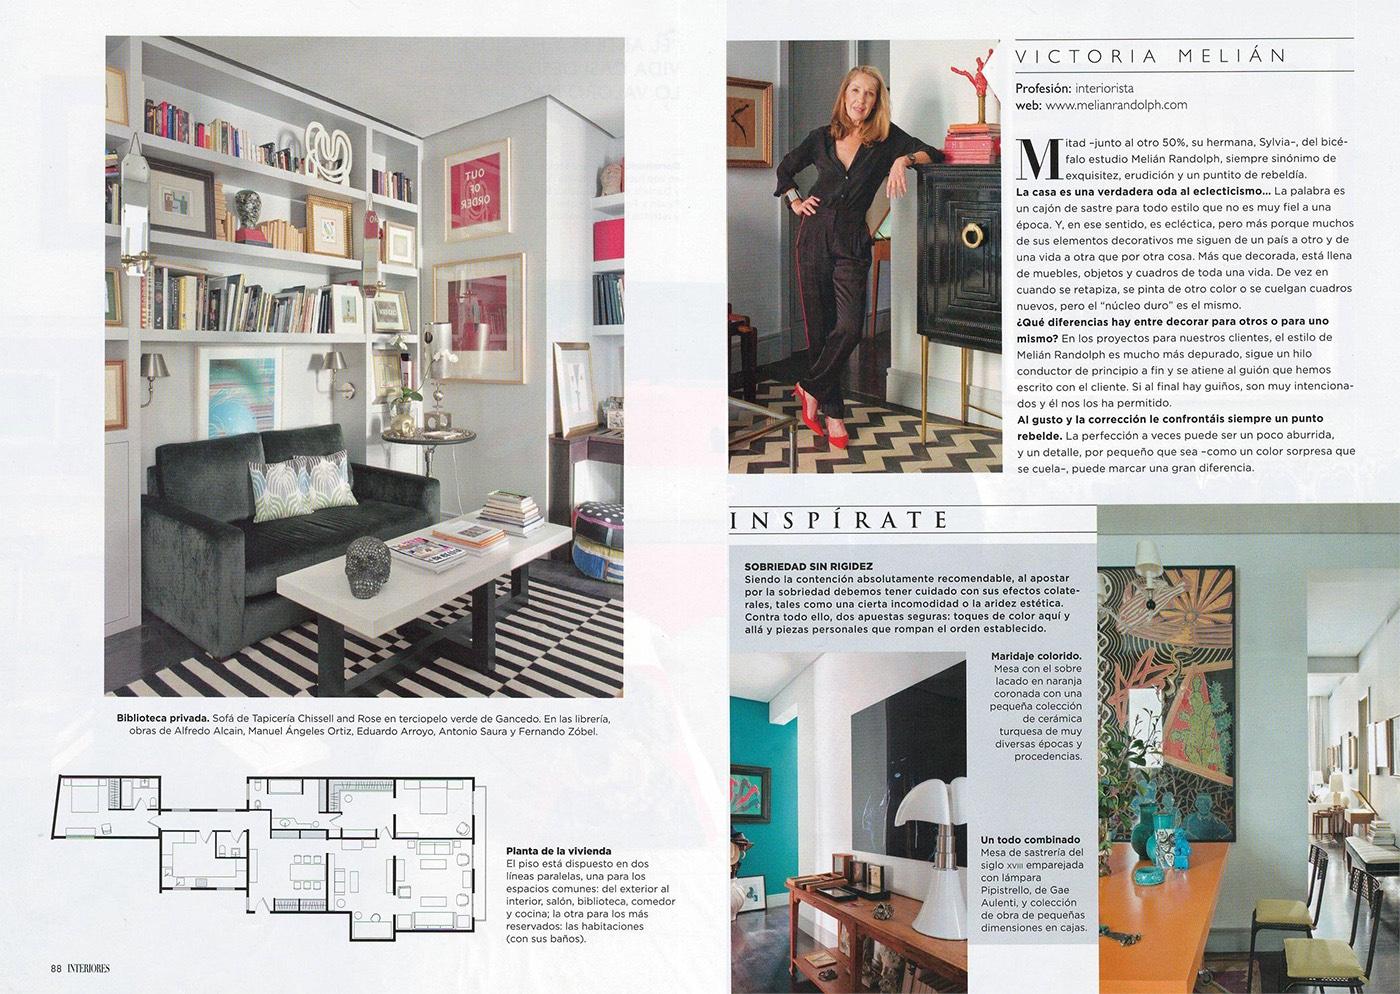 revista-interiores-mayo 2016-melian-randolph-10-casa-g